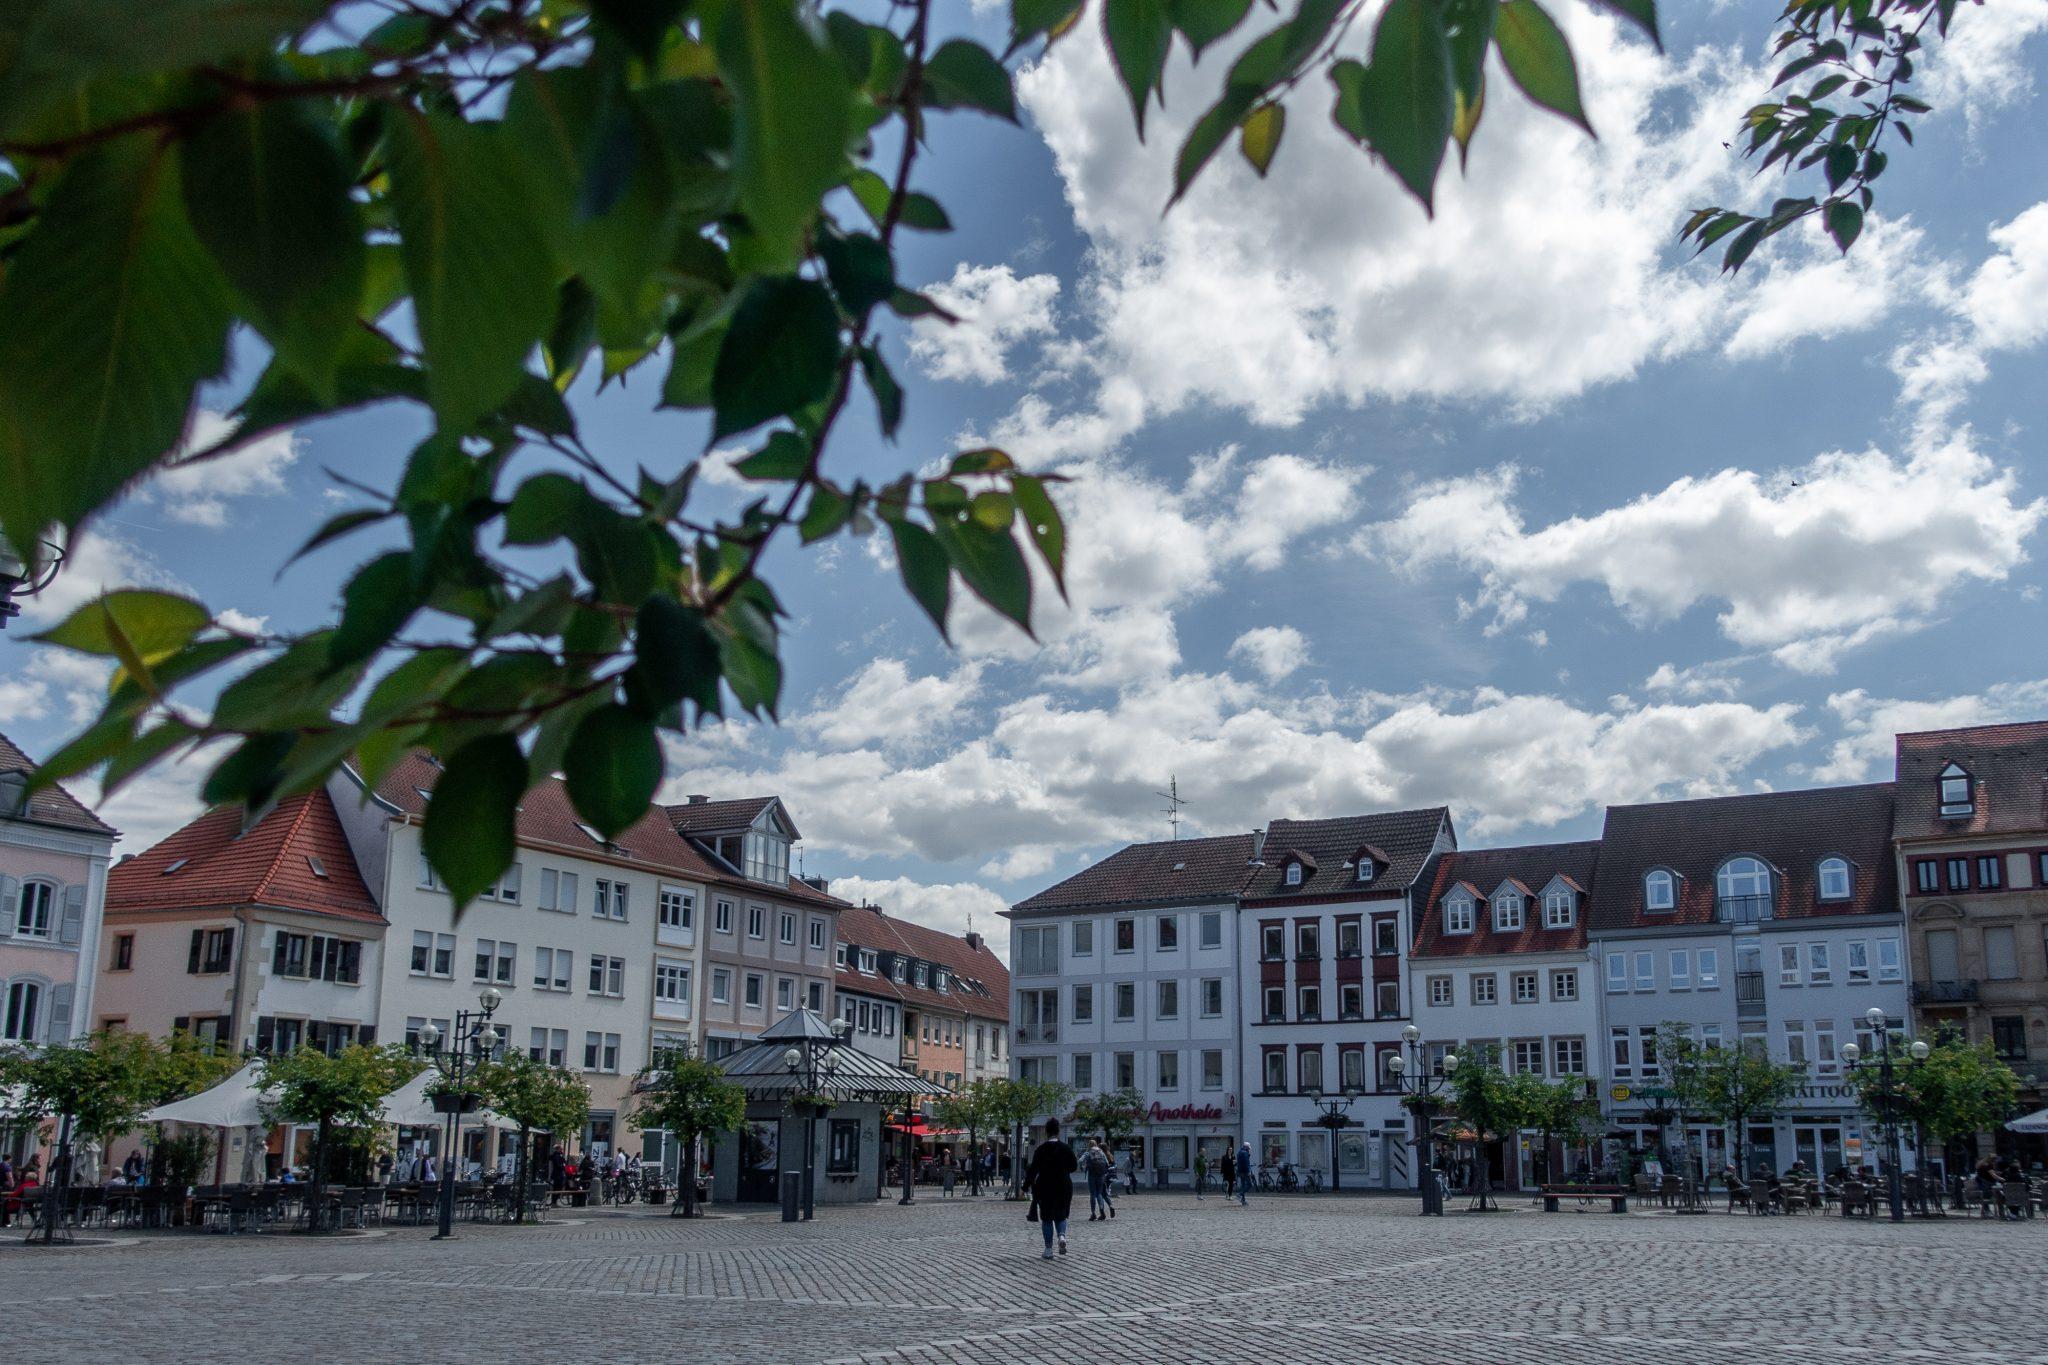 Landau-pfalz-rathausplatz